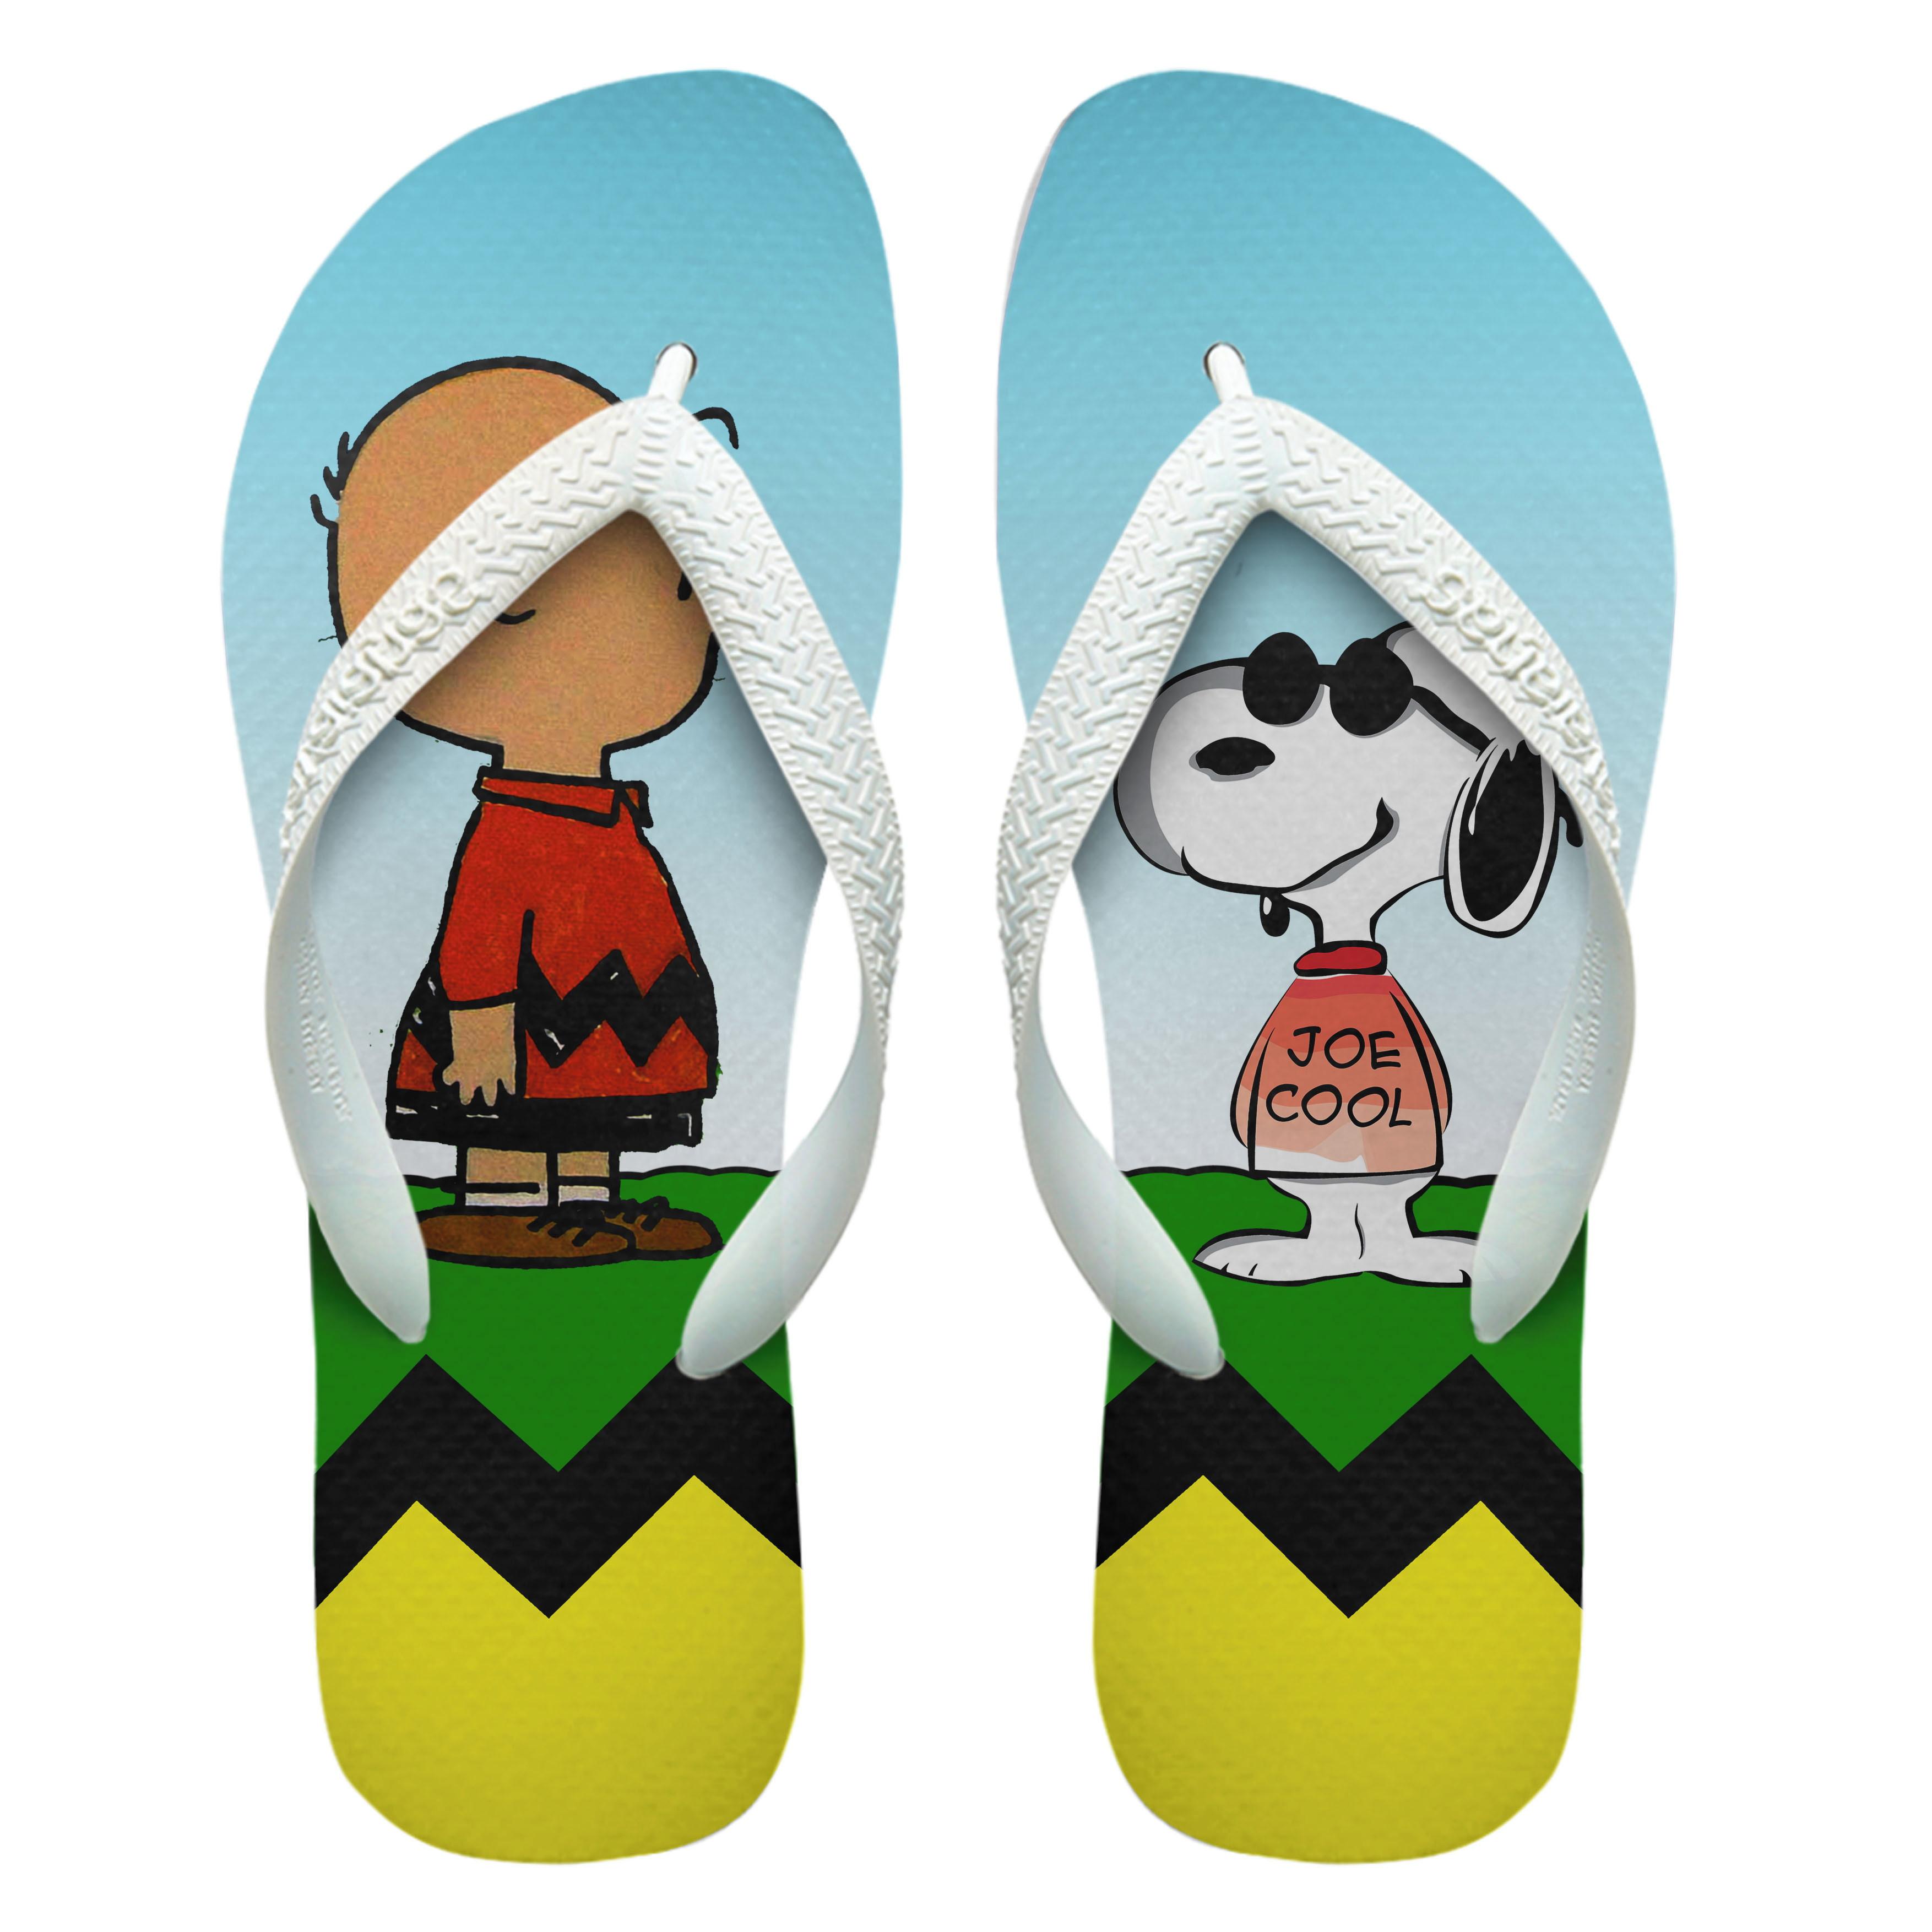 83159fc0a Chinelos Personalizados Havaianas Snoopy e Charlie Brown [3] no Elo7 | Chinelos  Personalizados Print Mix (EBA9CB)